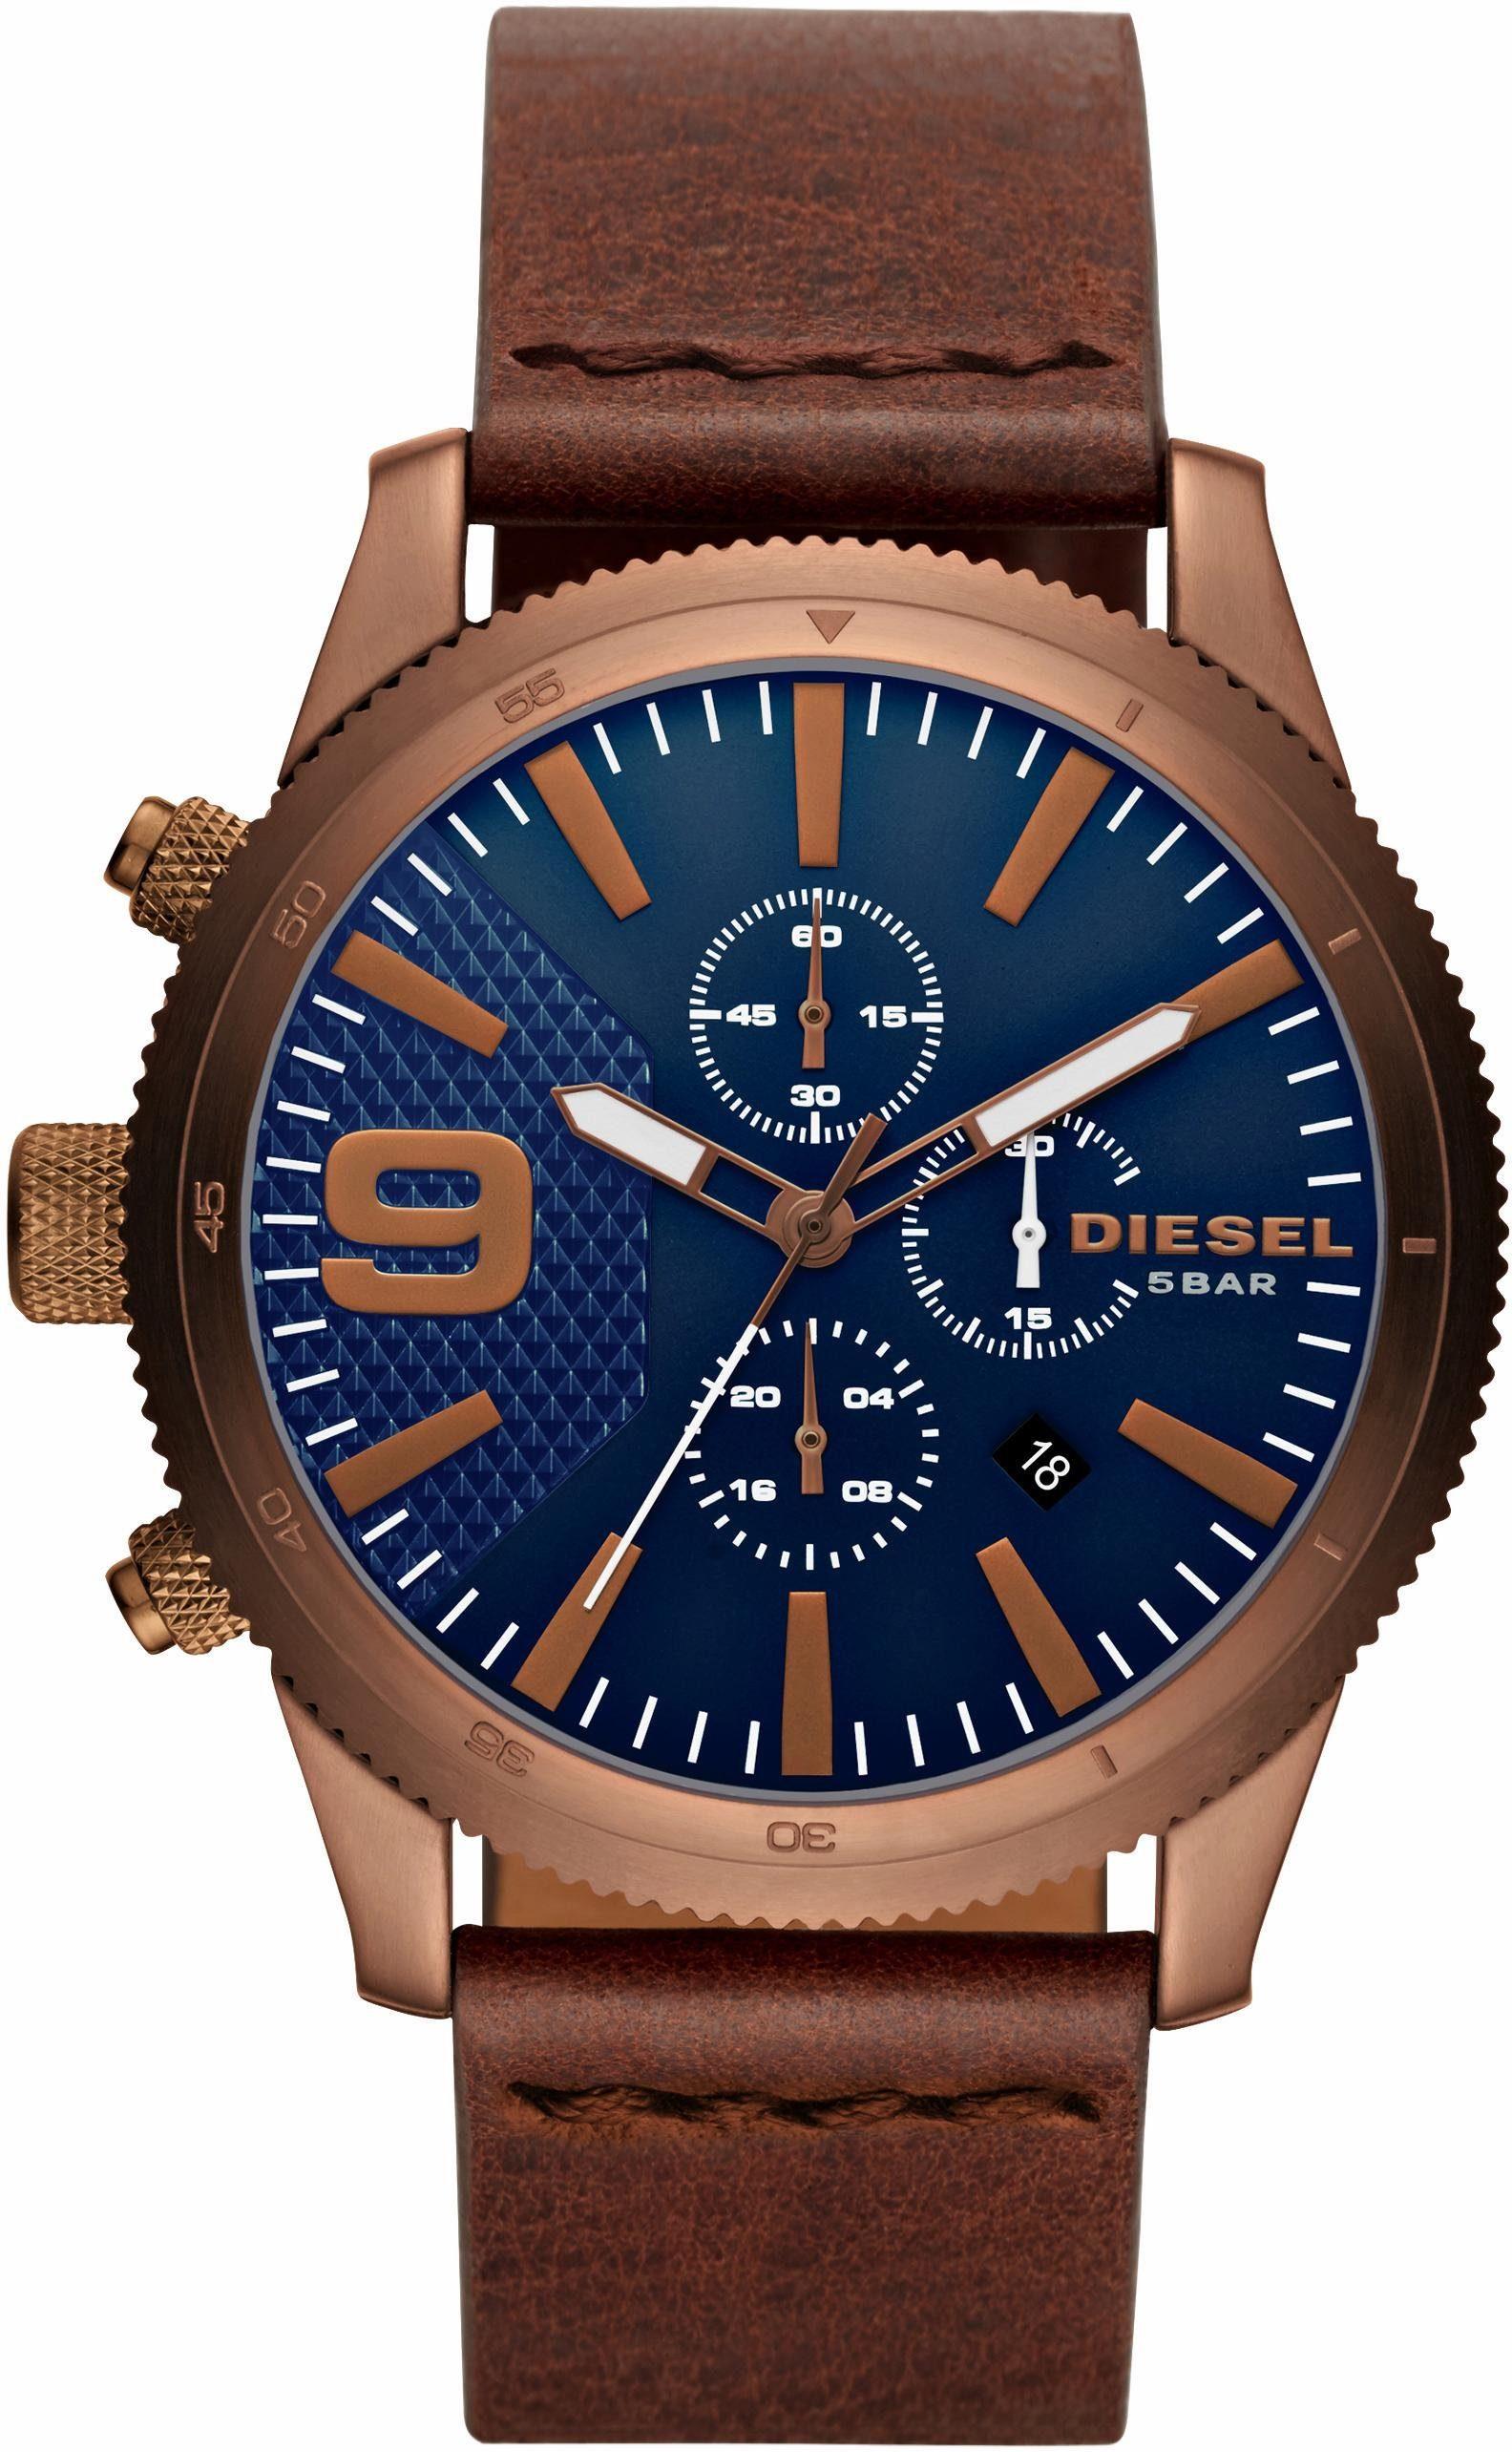 Diesel Chronograph »RASP CHRONO 46, DZ4455«